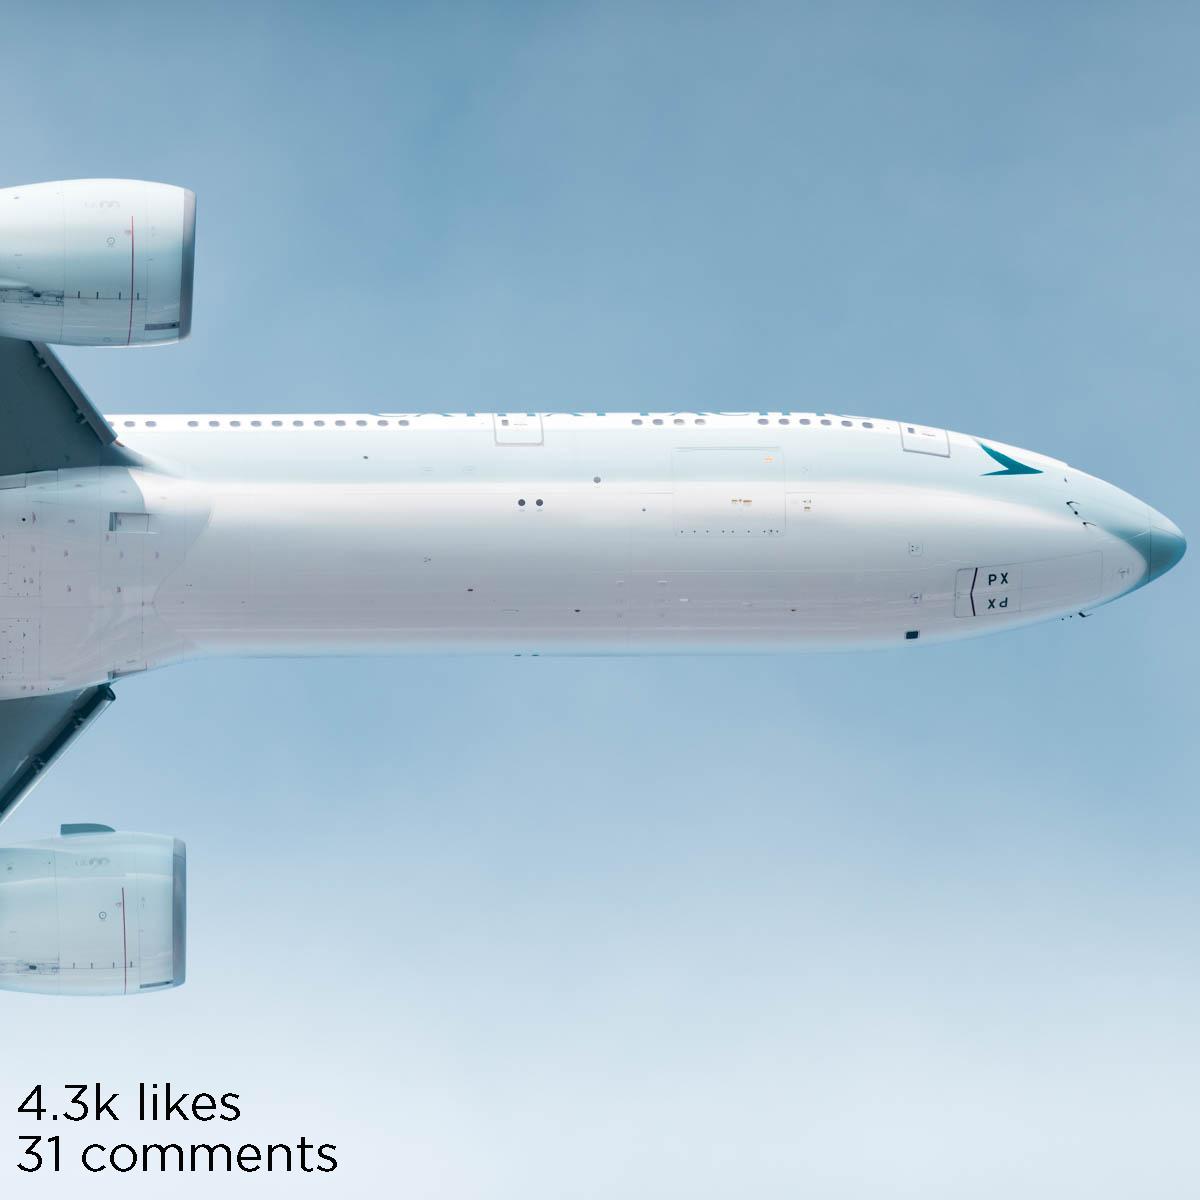 cs 777 new livery (1 of 1) copy.jpg